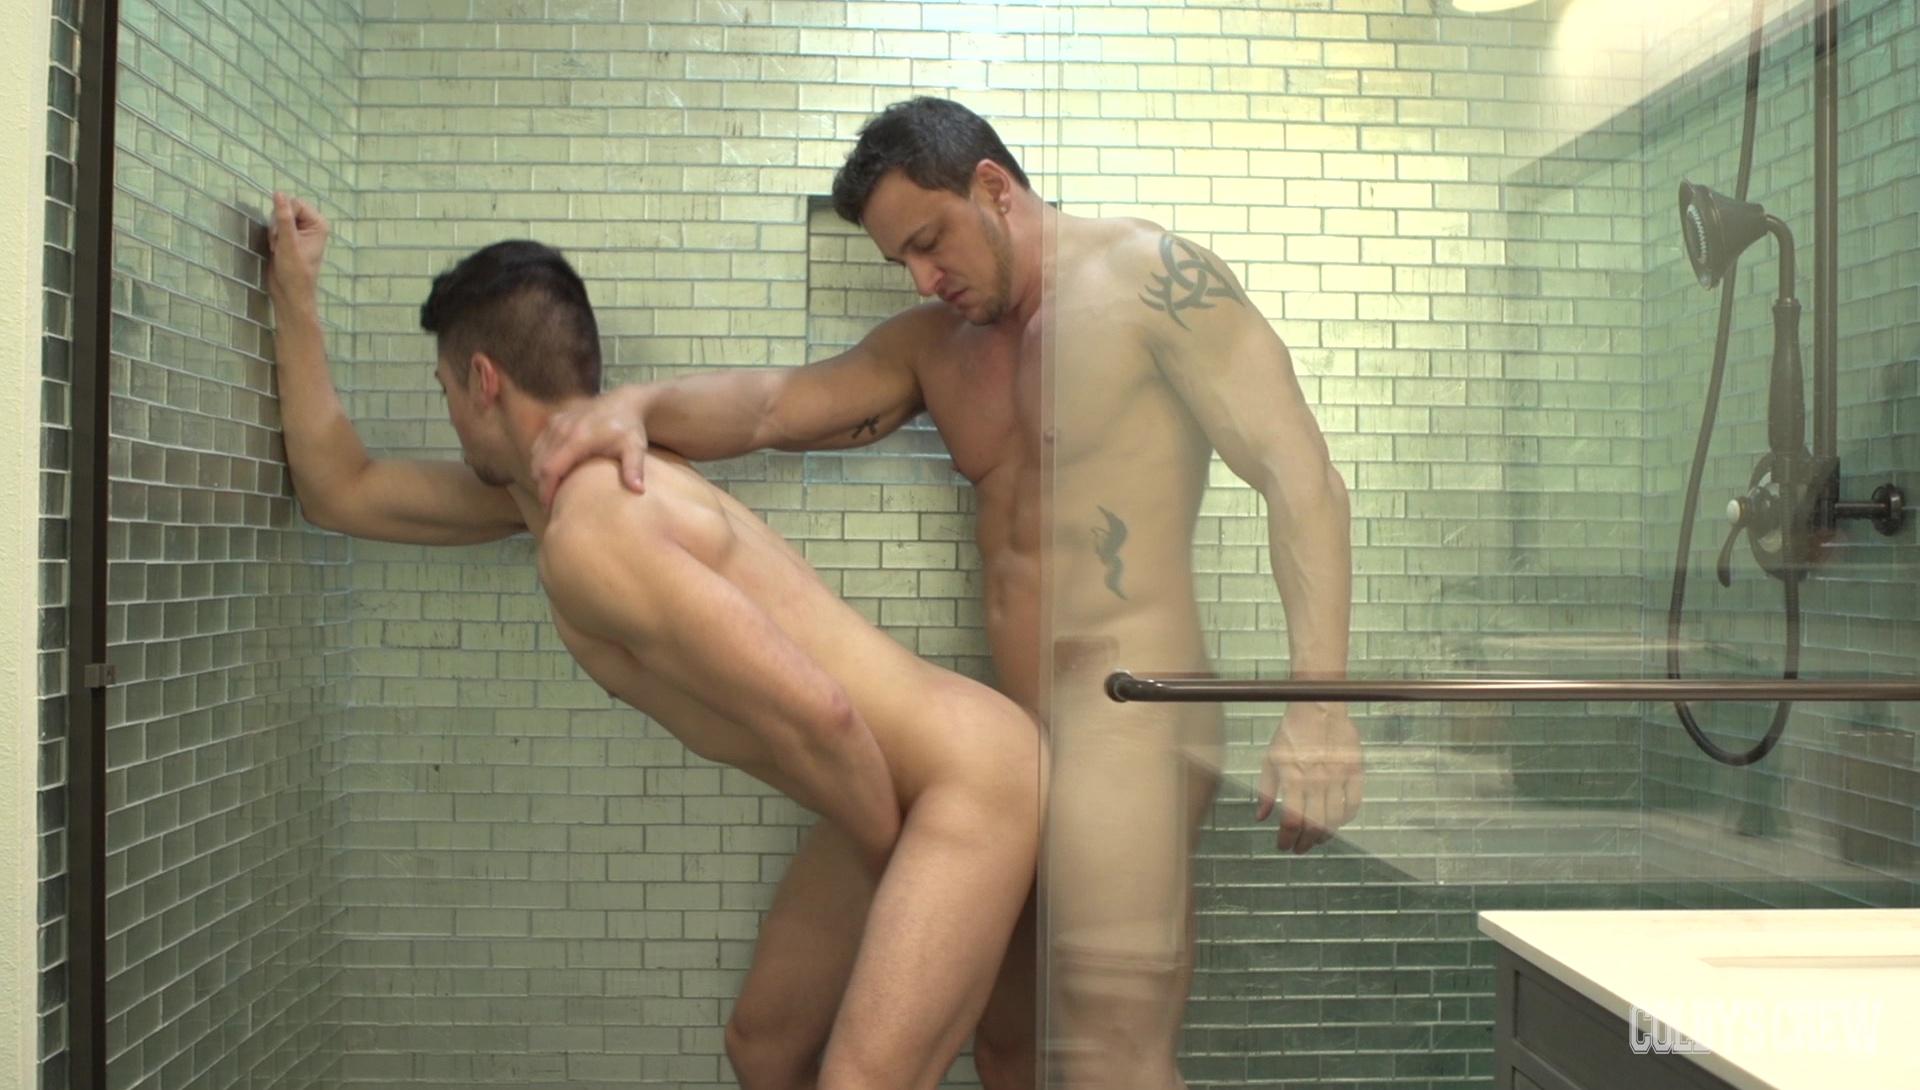 Joey D and Brett Dylan